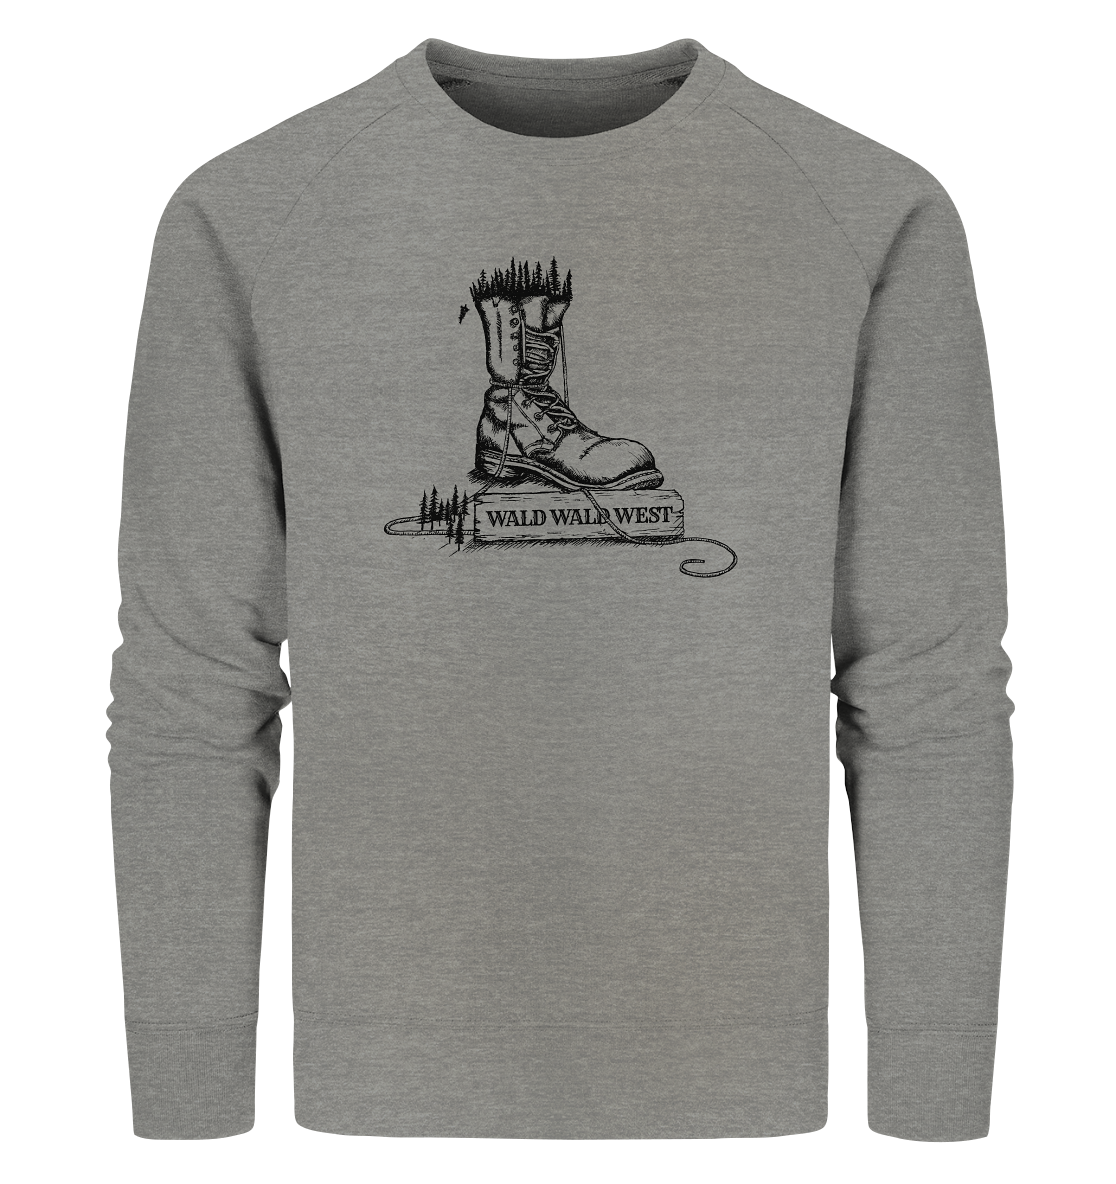 front-organic-sweatshirt-818381-1116x.png